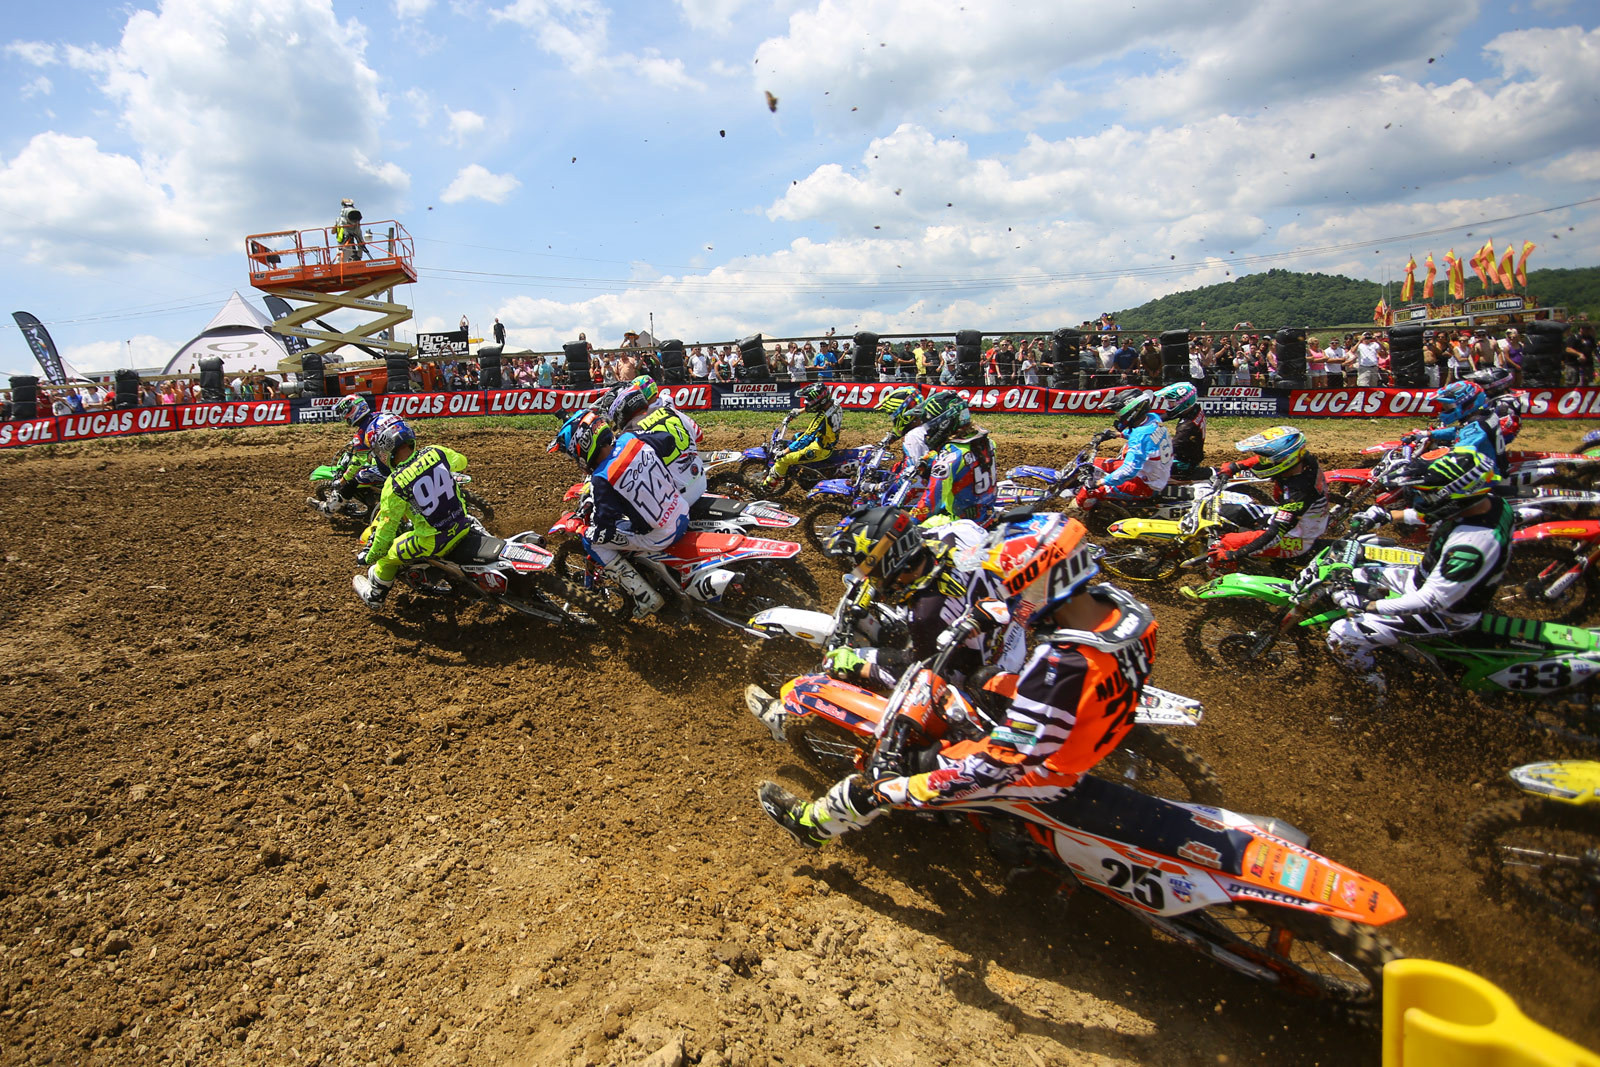 Photo Blast from High Point Raceway. 450 moto one start. - Photo Blast: High Point - Motocross Pictures - Vital MX